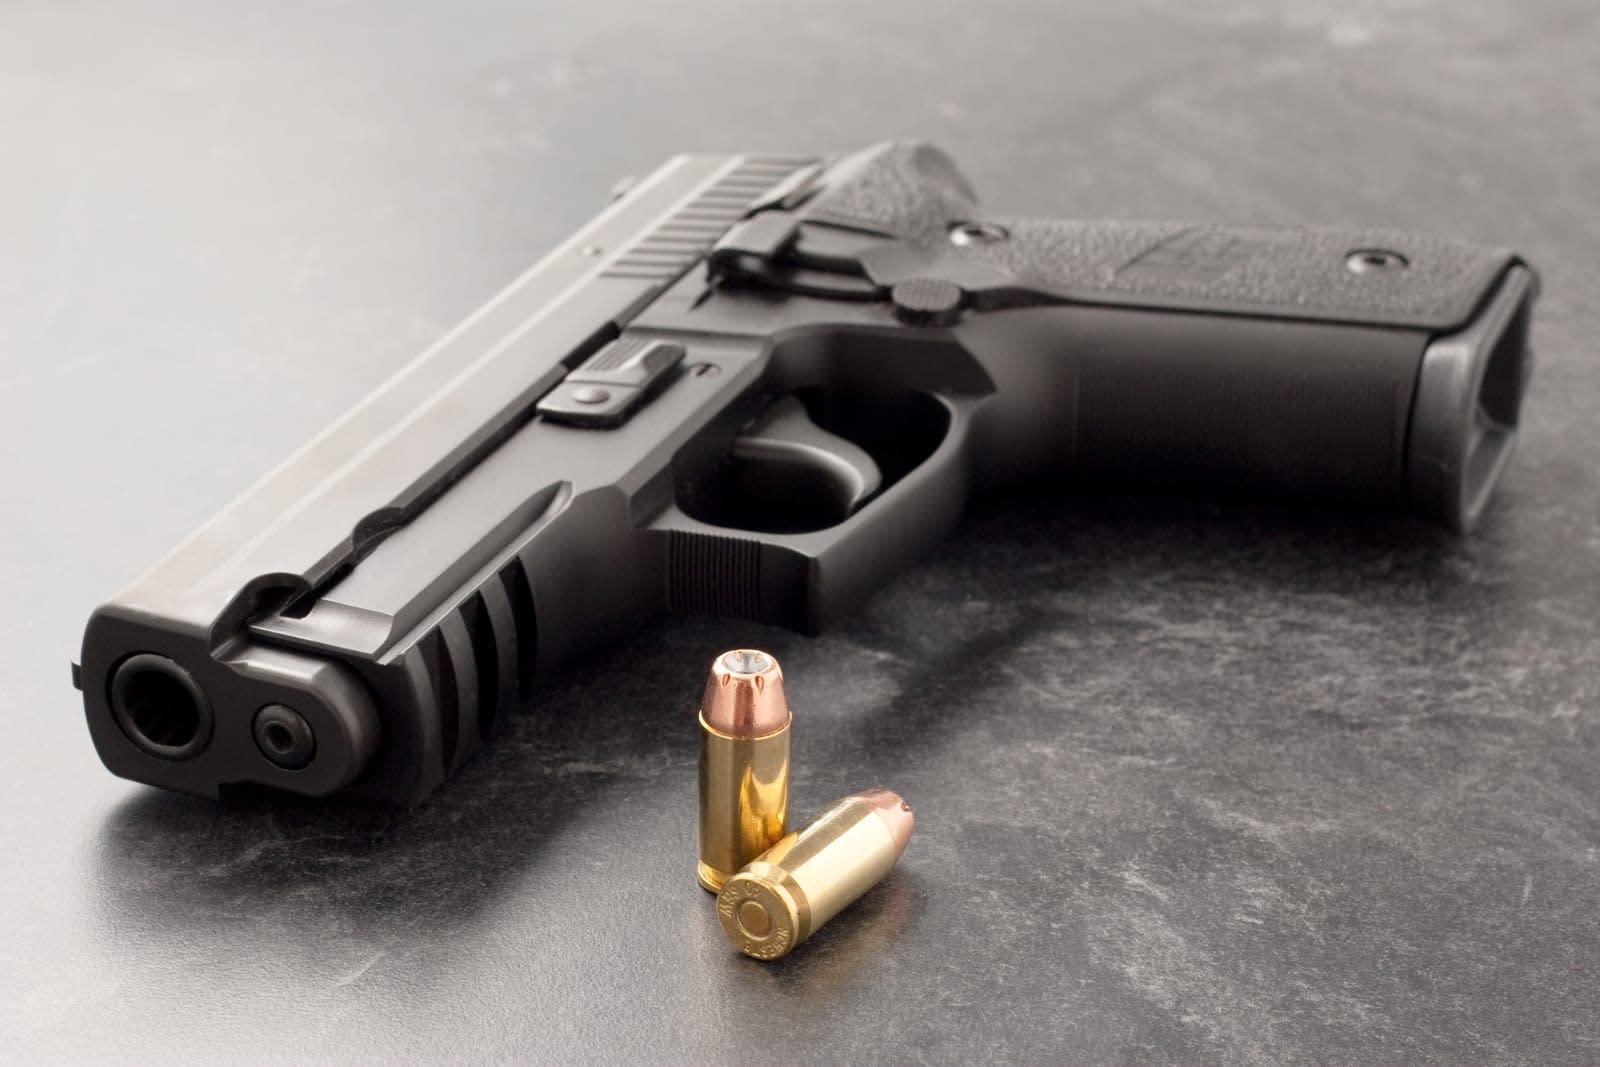 Facebook blocks gun accessory ads to the under 18s